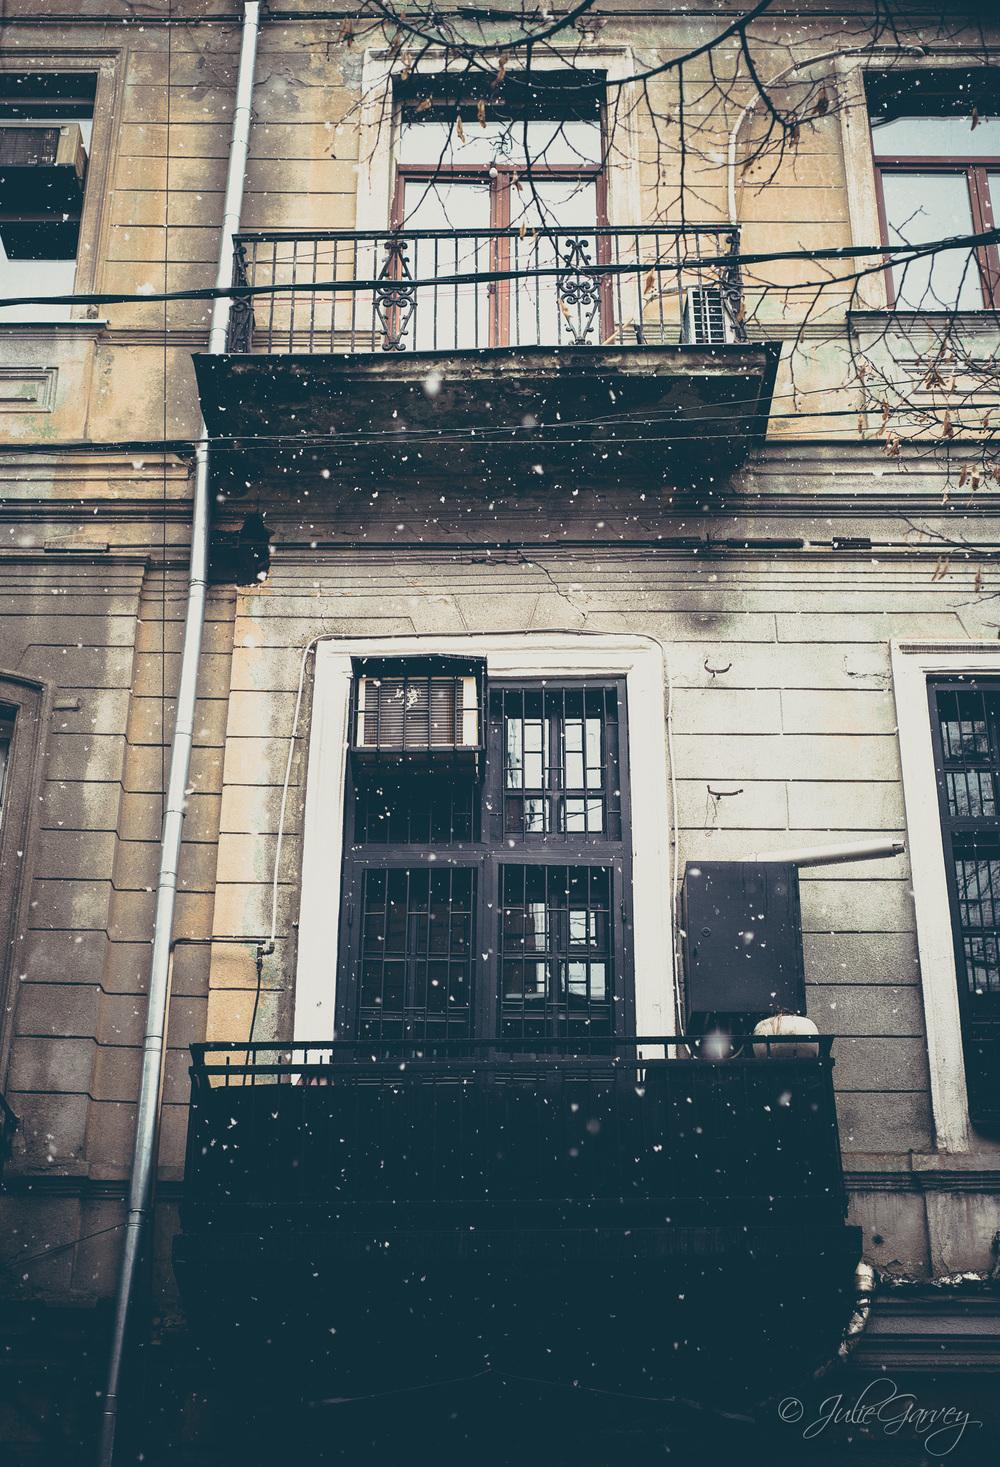 URBAN-Tbilisi-Online-2616.jpg